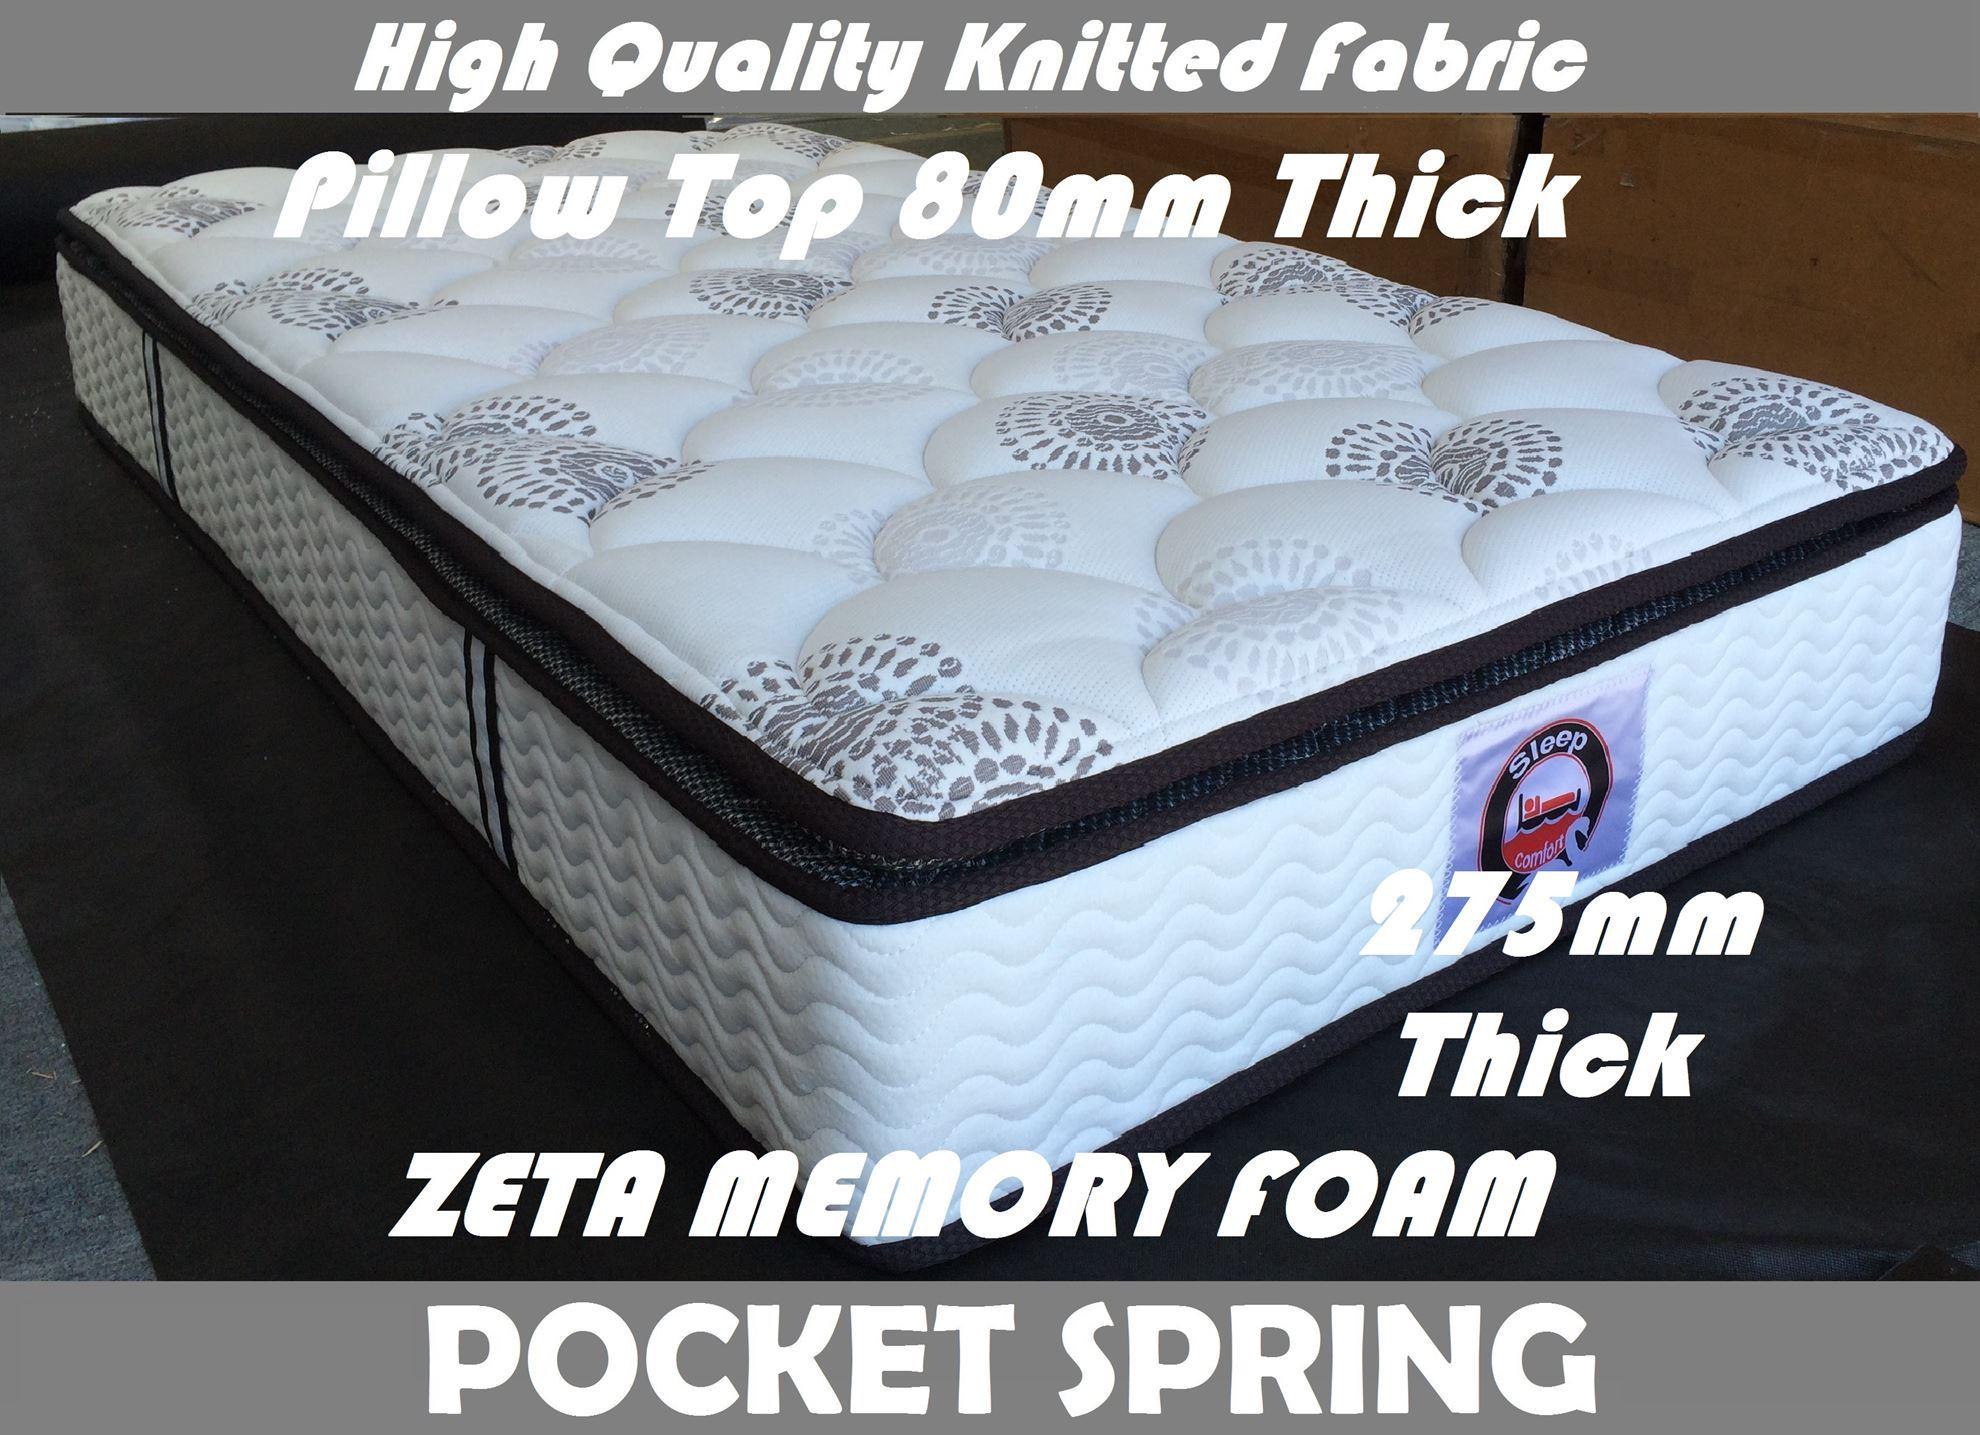 zeta single mattress pocket spring memory foam pillow top